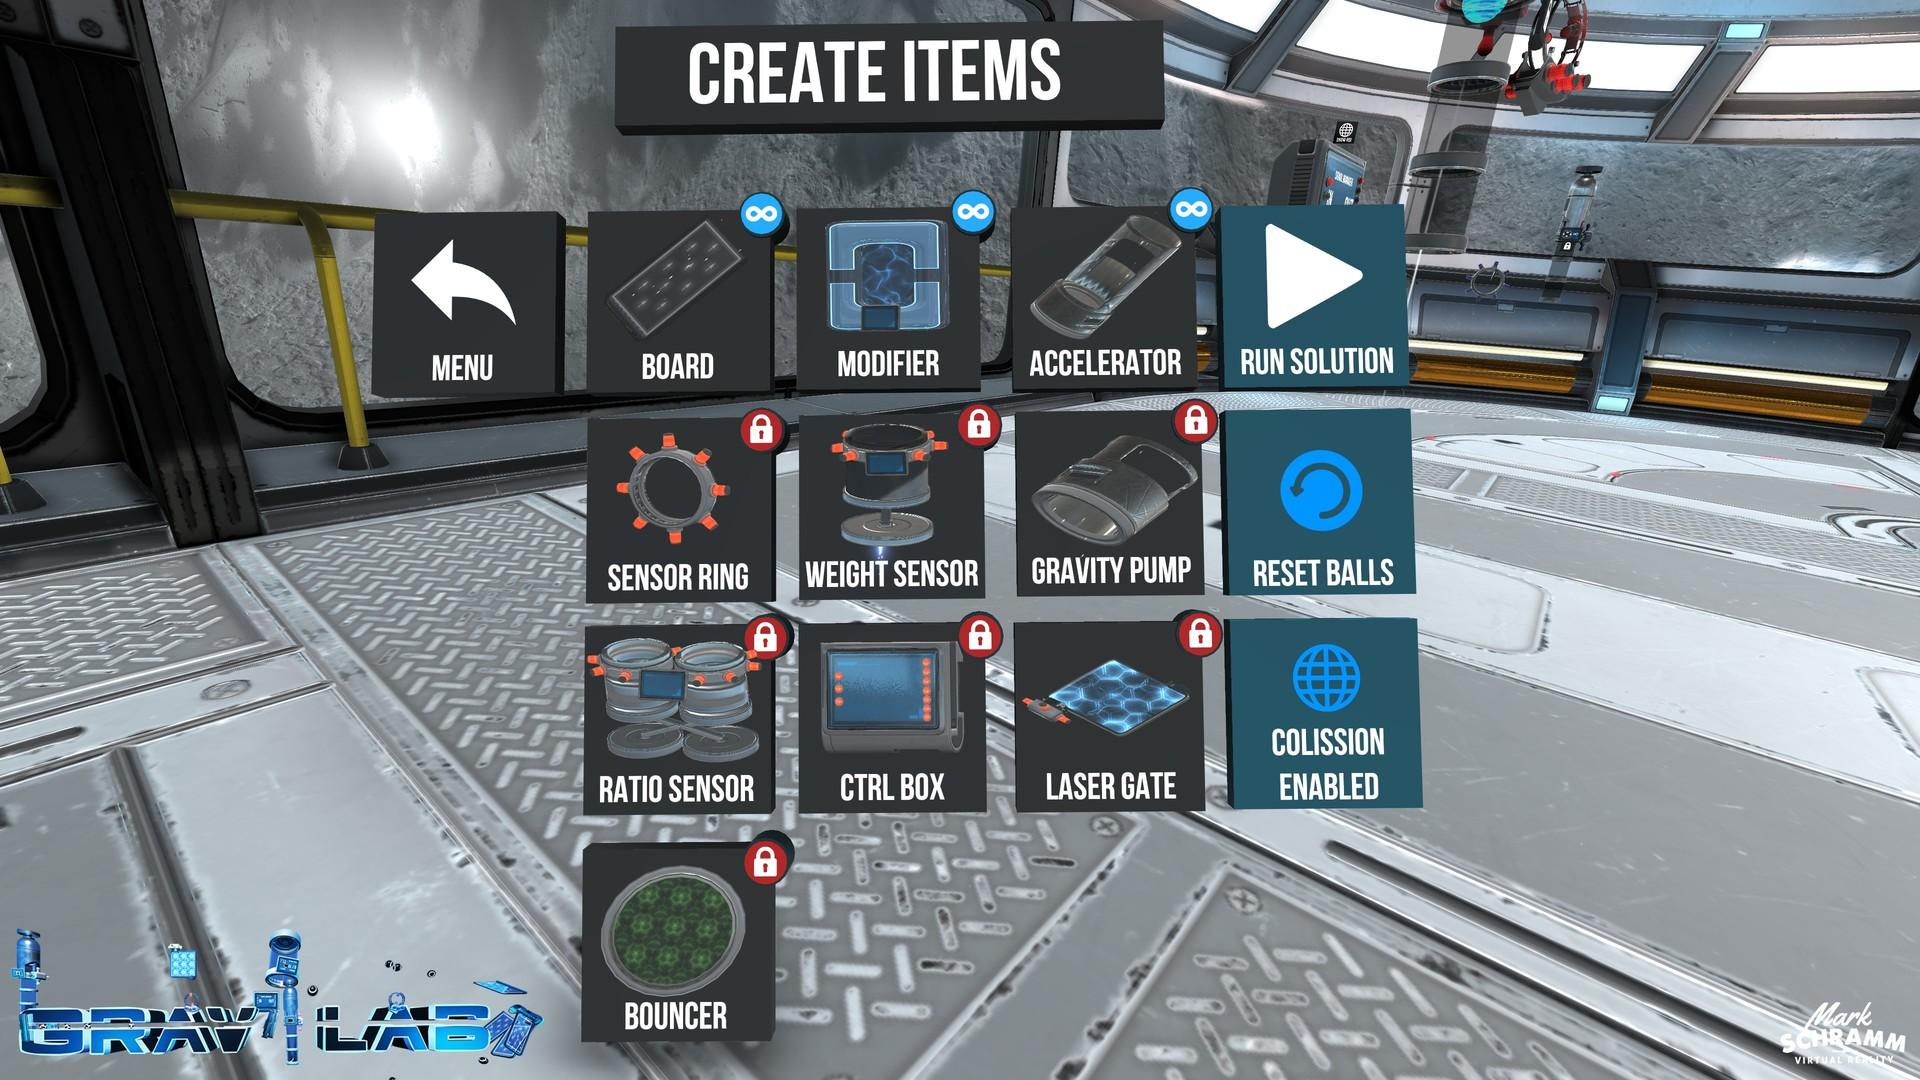 Gravlab_items.jpg